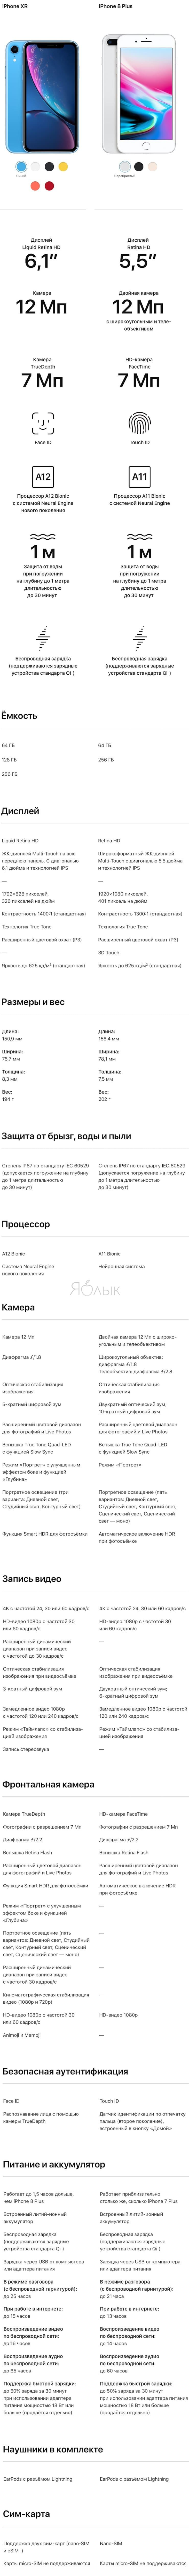 iPhone XR и iPhone 8 Plus сравнение